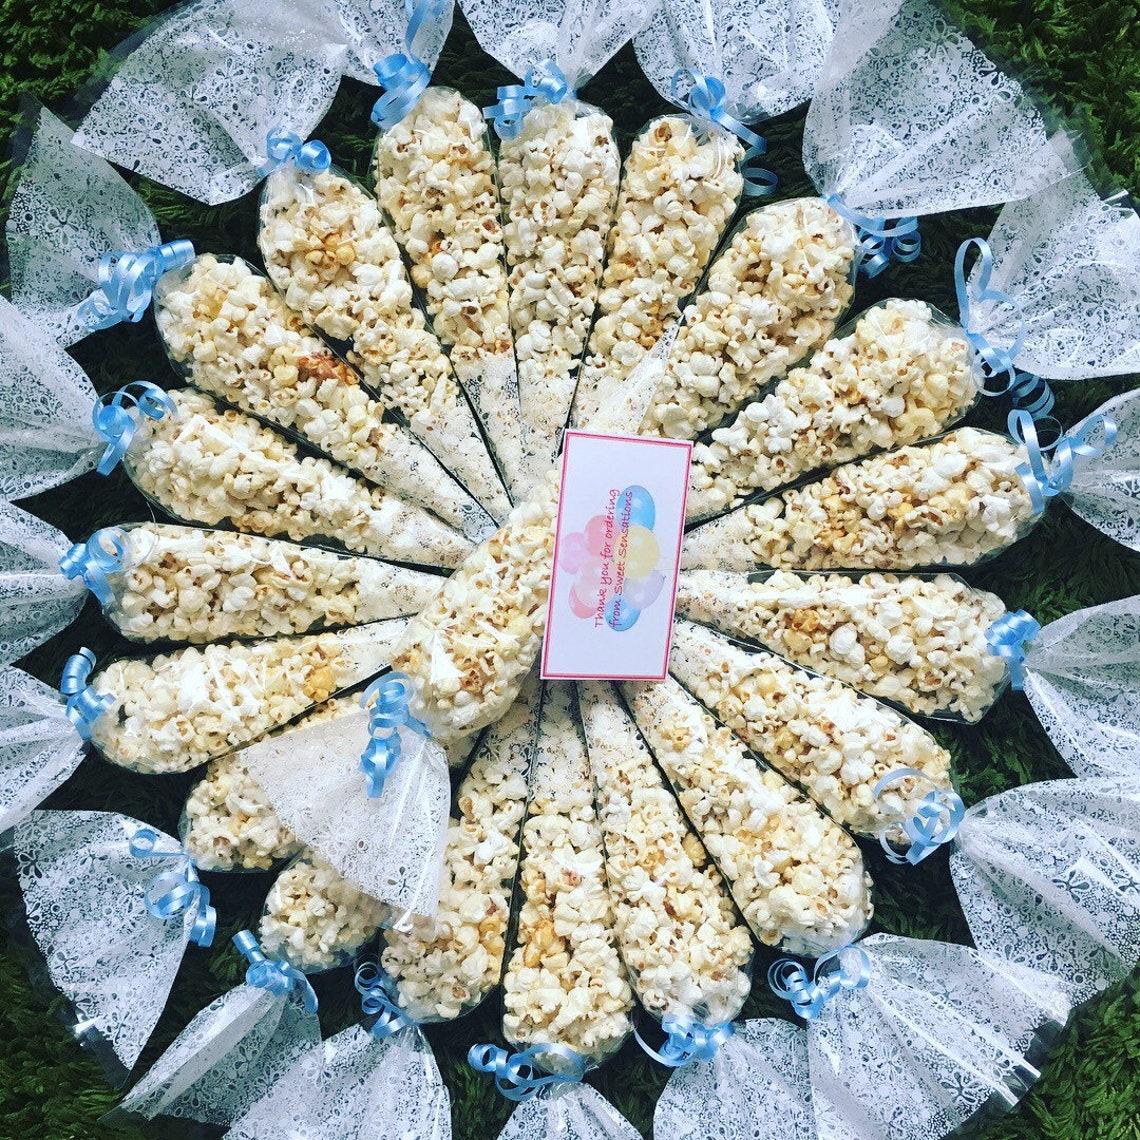 Personalised popcorn